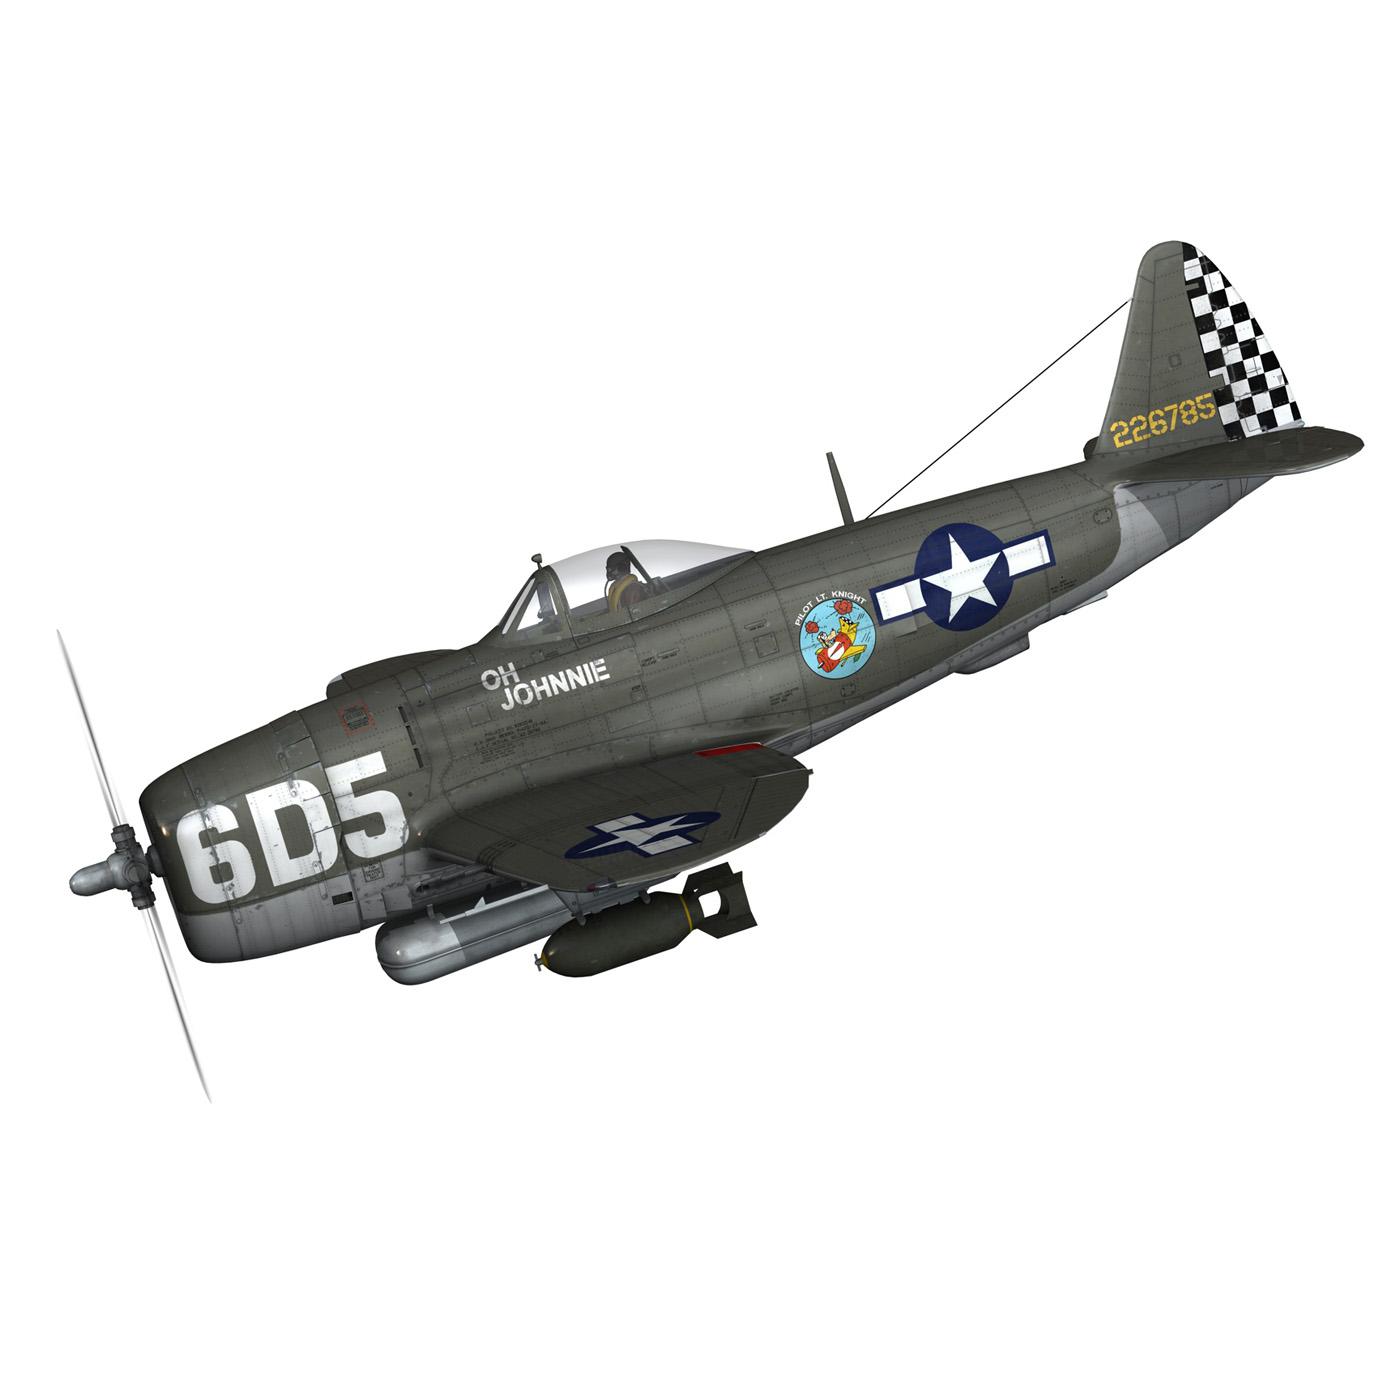 republic p-47 thunderbolt – oh johnnie 3d model fbx c4d lwo obj 274248